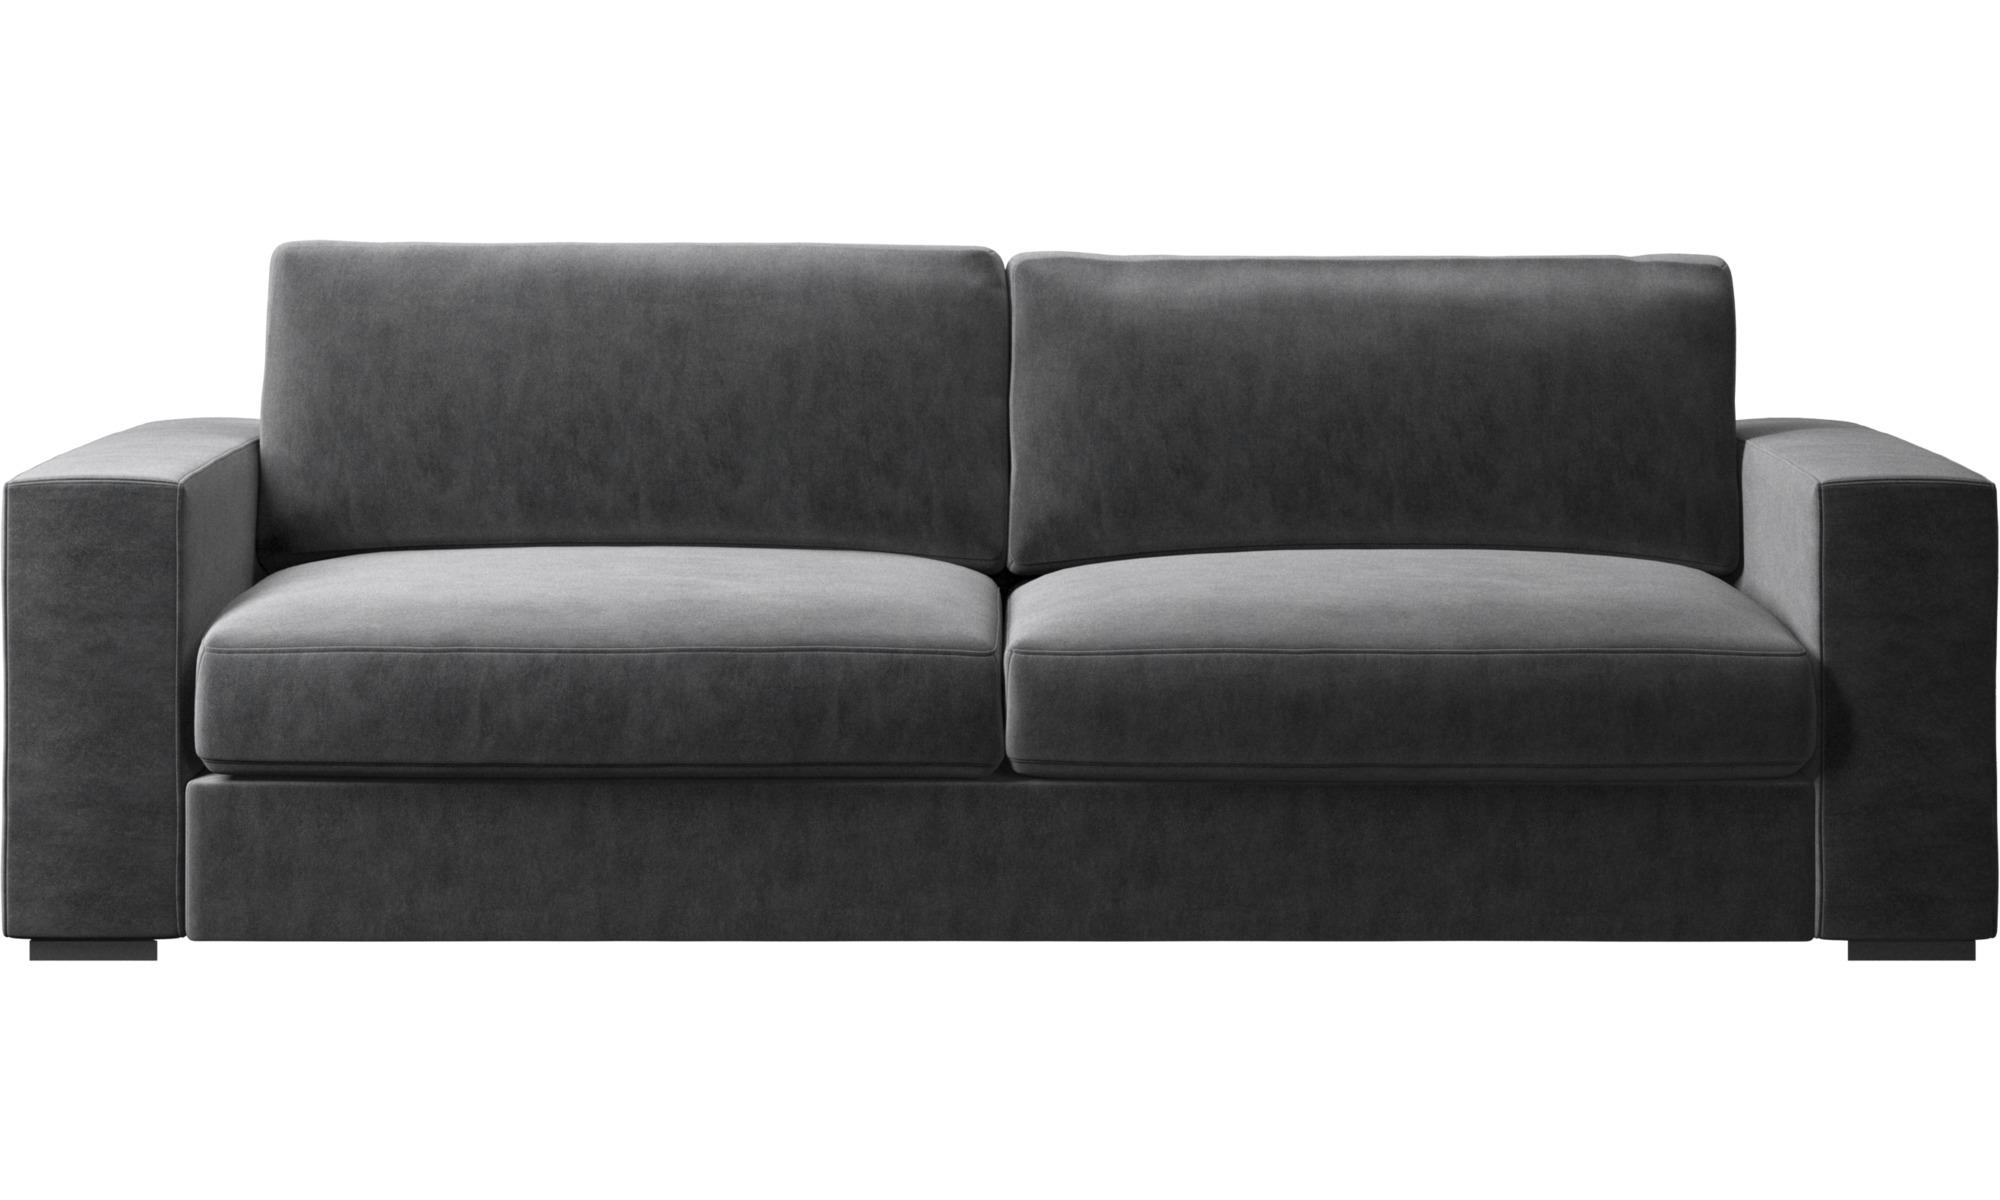 3 istuttavat sohvat cenova sohva boconcept. Black Bedroom Furniture Sets. Home Design Ideas